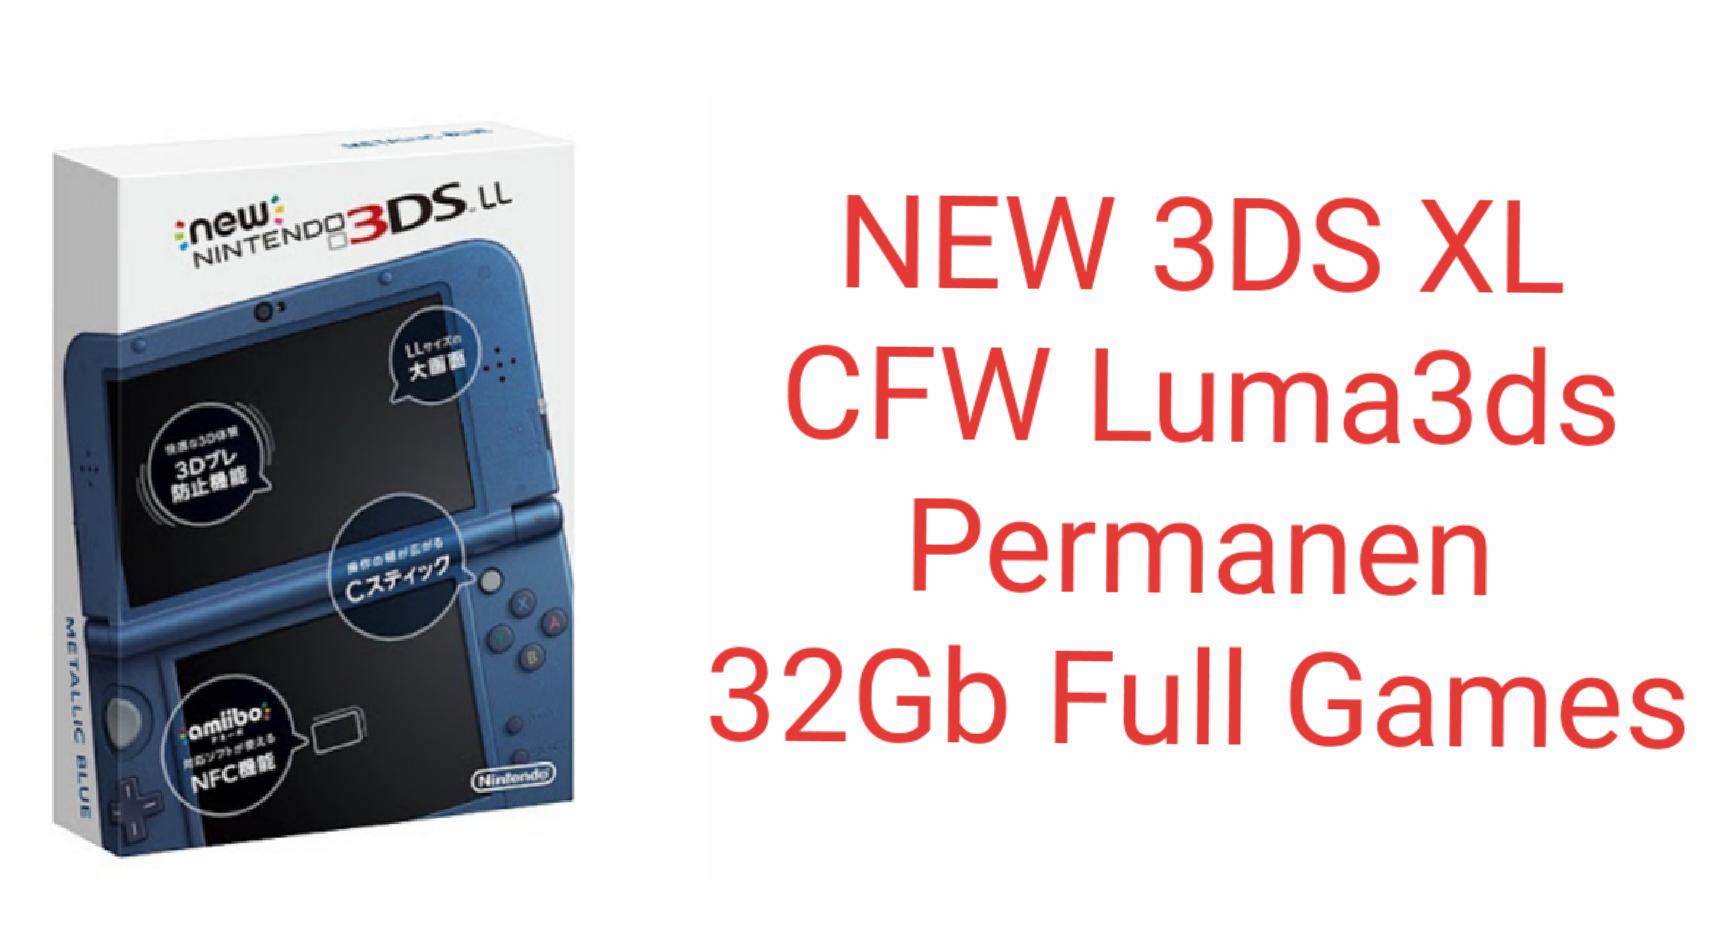 Nintendo New 3ds Xl Cfw 32gb Hitam Daftar Harga Terbaru Dan Ll Lime Black Luma Jual Full Games Luma3ds Permanen Biru